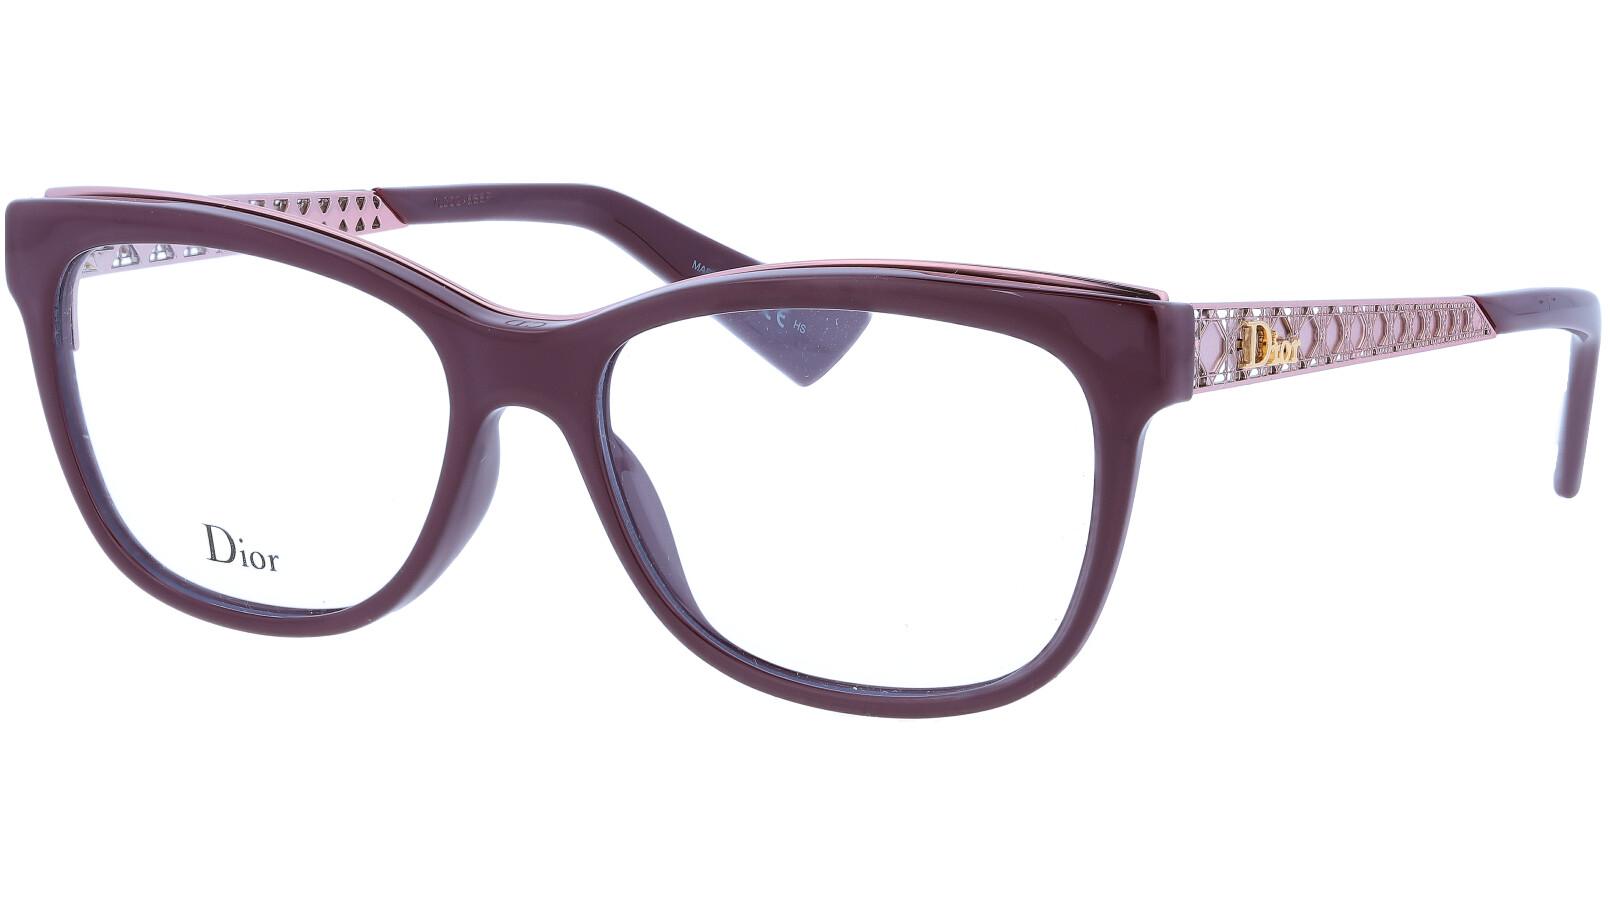 Dior AMAO1 F8P 53 BurgunD Glasses